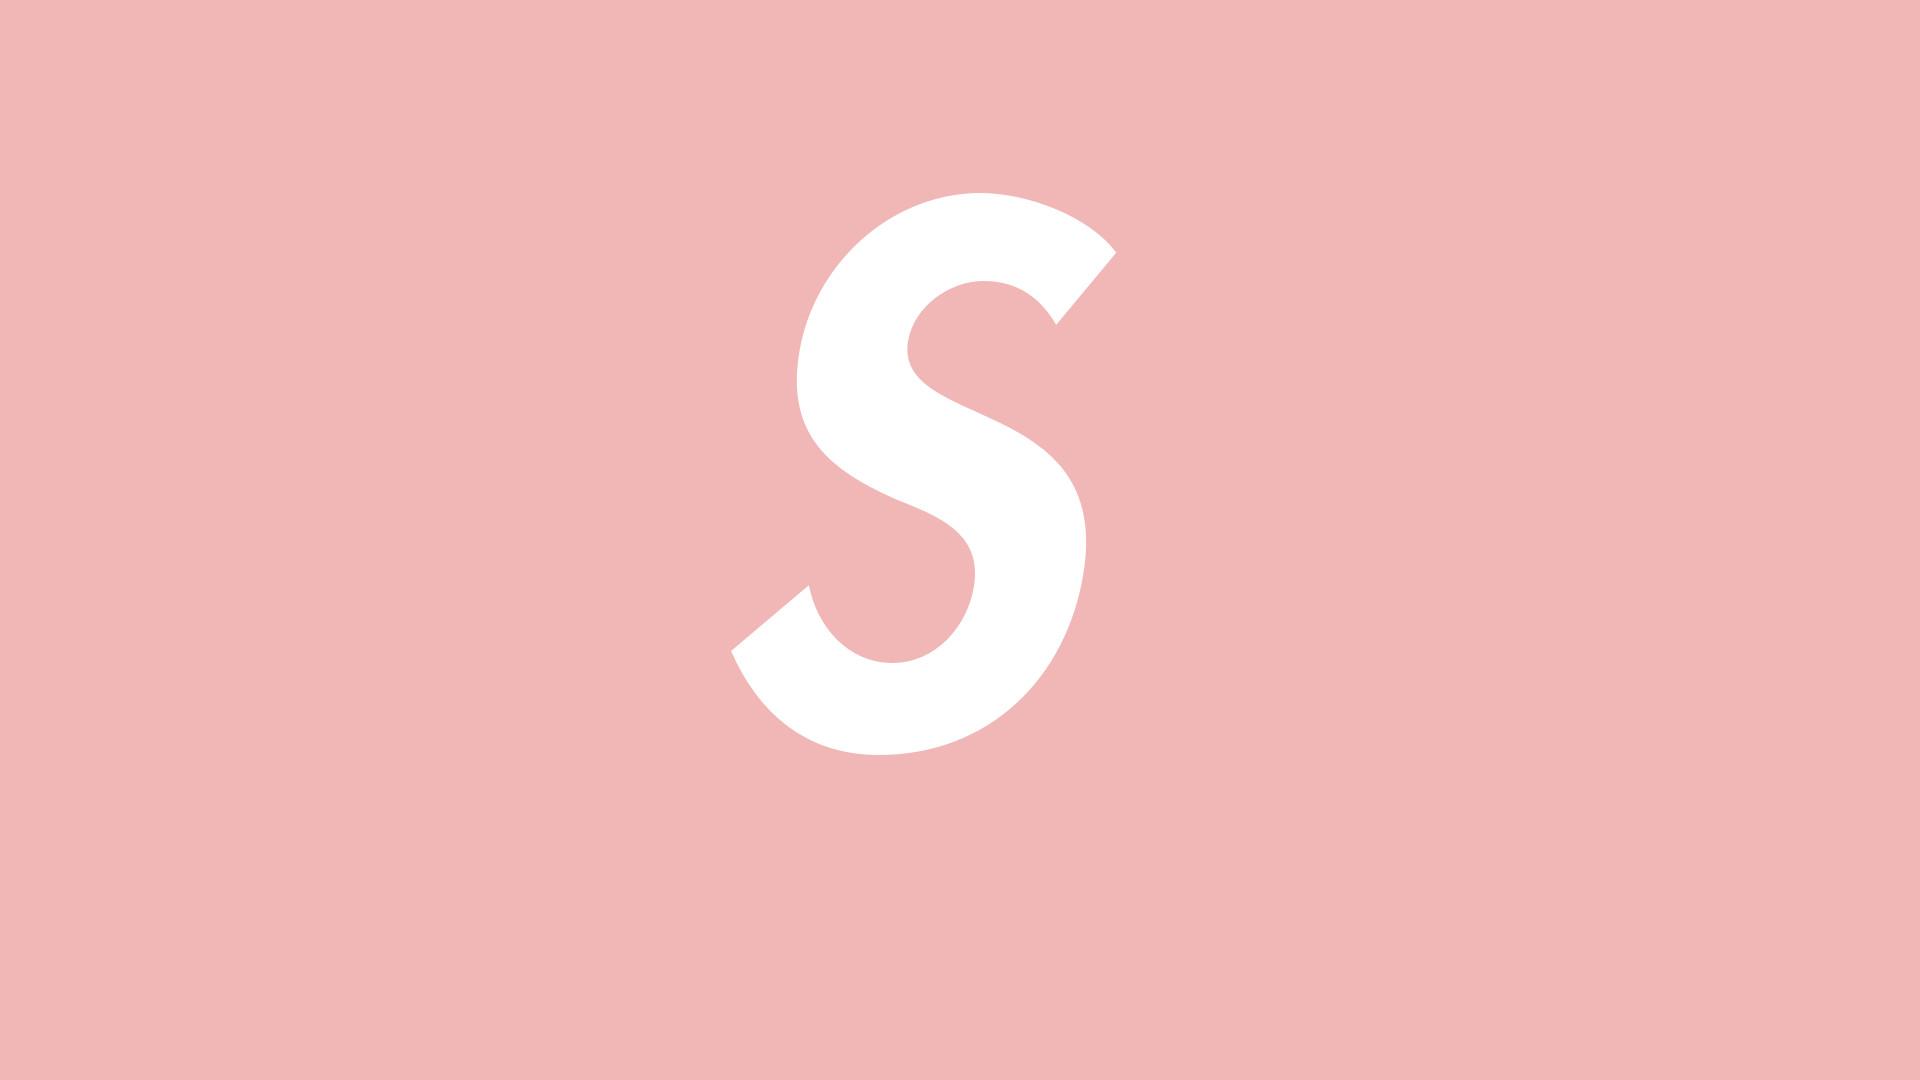 Pink/Salmon: https://i.imgur.com/PCI4rQH.png …